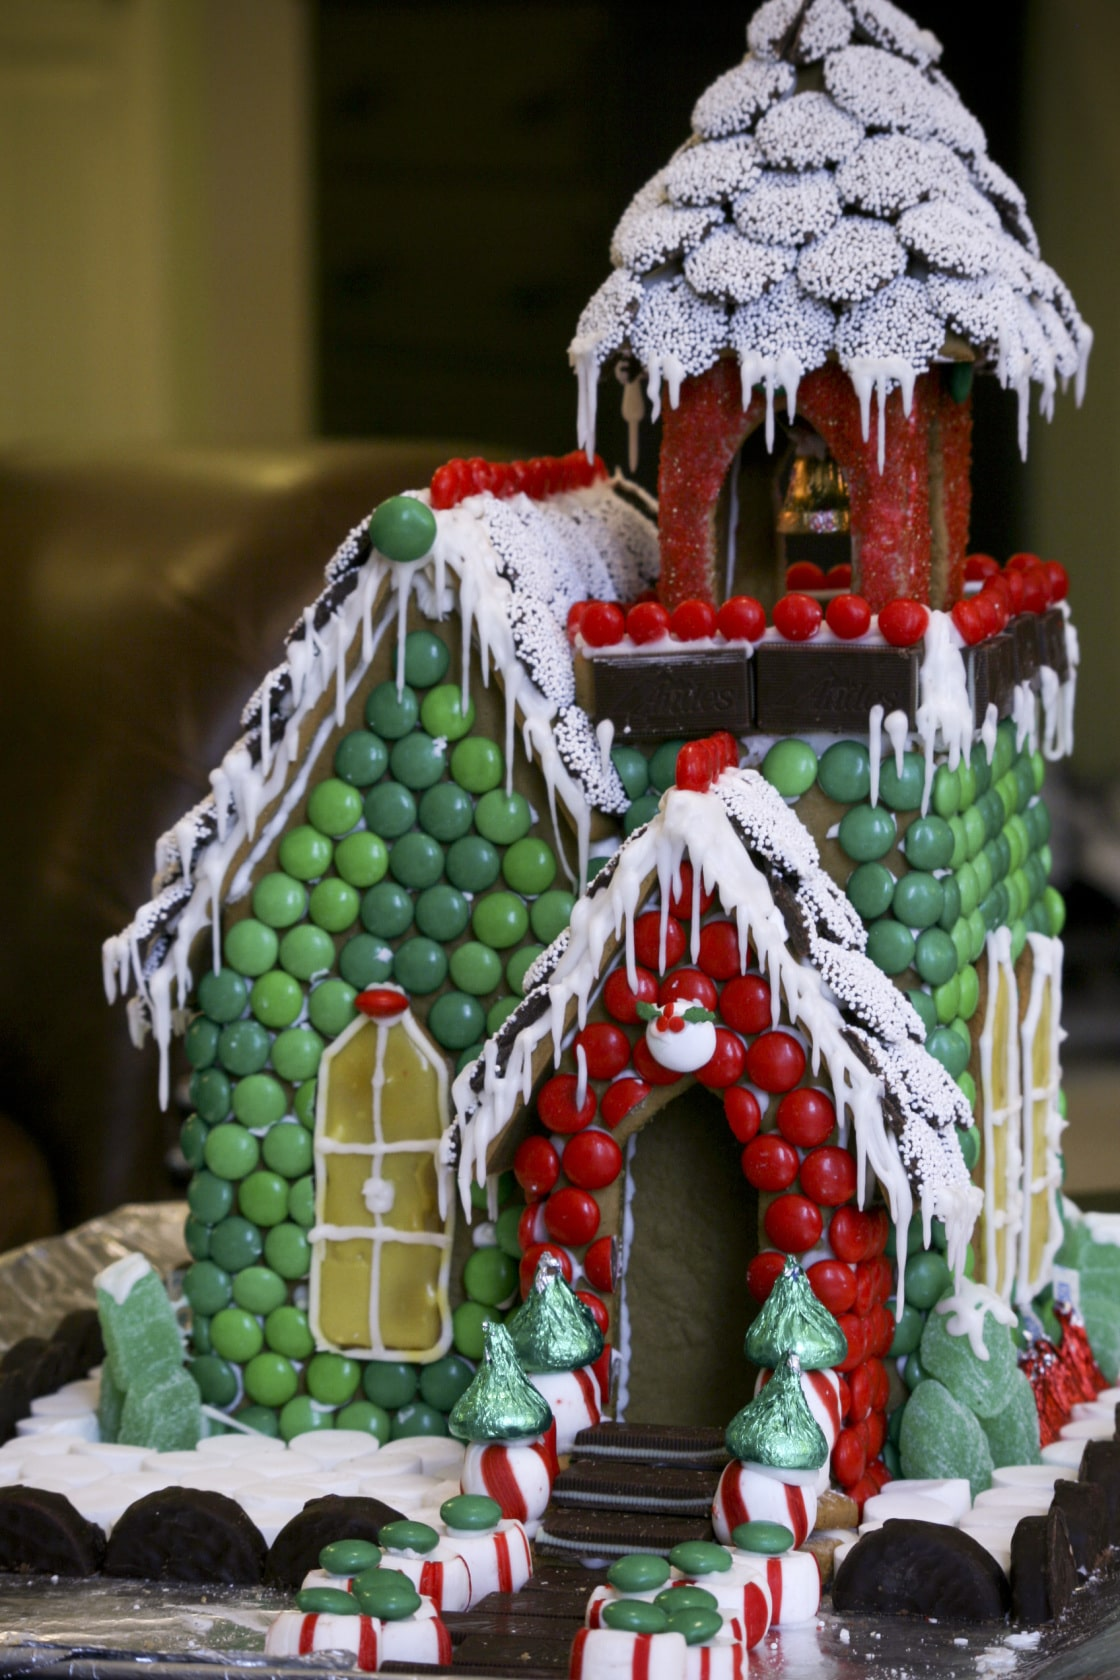 Beautiful Gingerbread Houses!